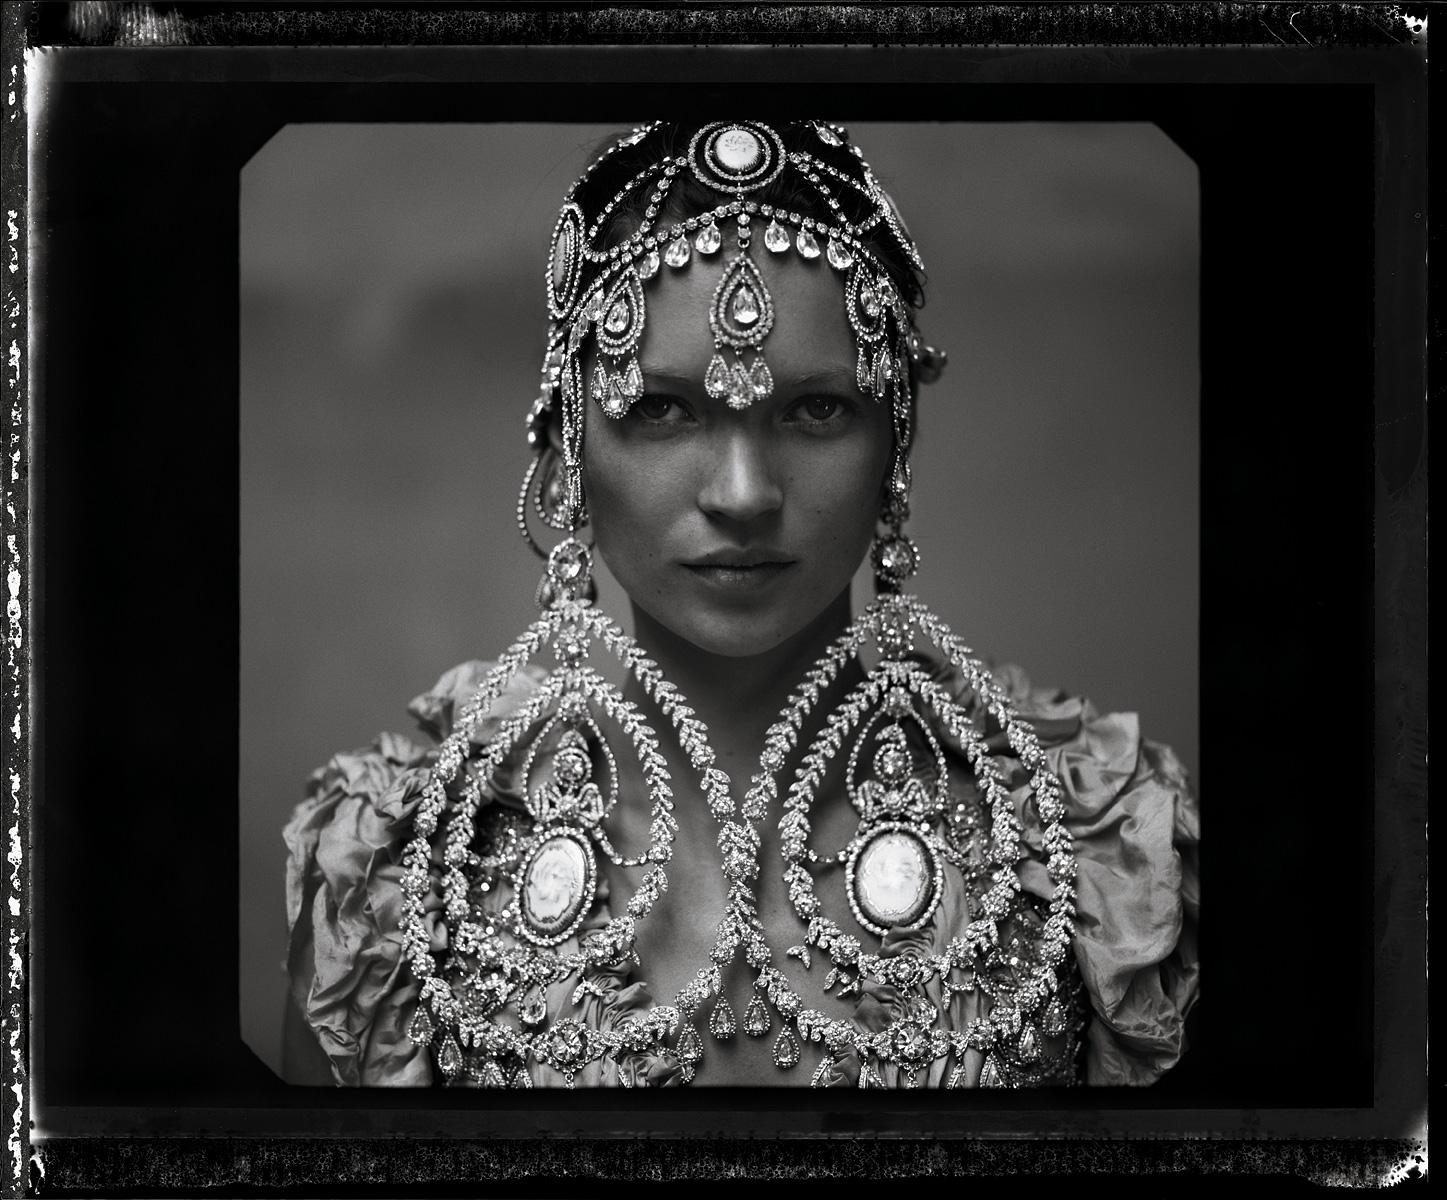 http://4.bp.blogspot.com/-eW5zHG_f6h0/TpyxbKIypuI/AAAAAAAANqY/eK8FMFaS9o8/s1600/Vogue+10%253A1999+photo+by+annie+Leibovitz.jpeg